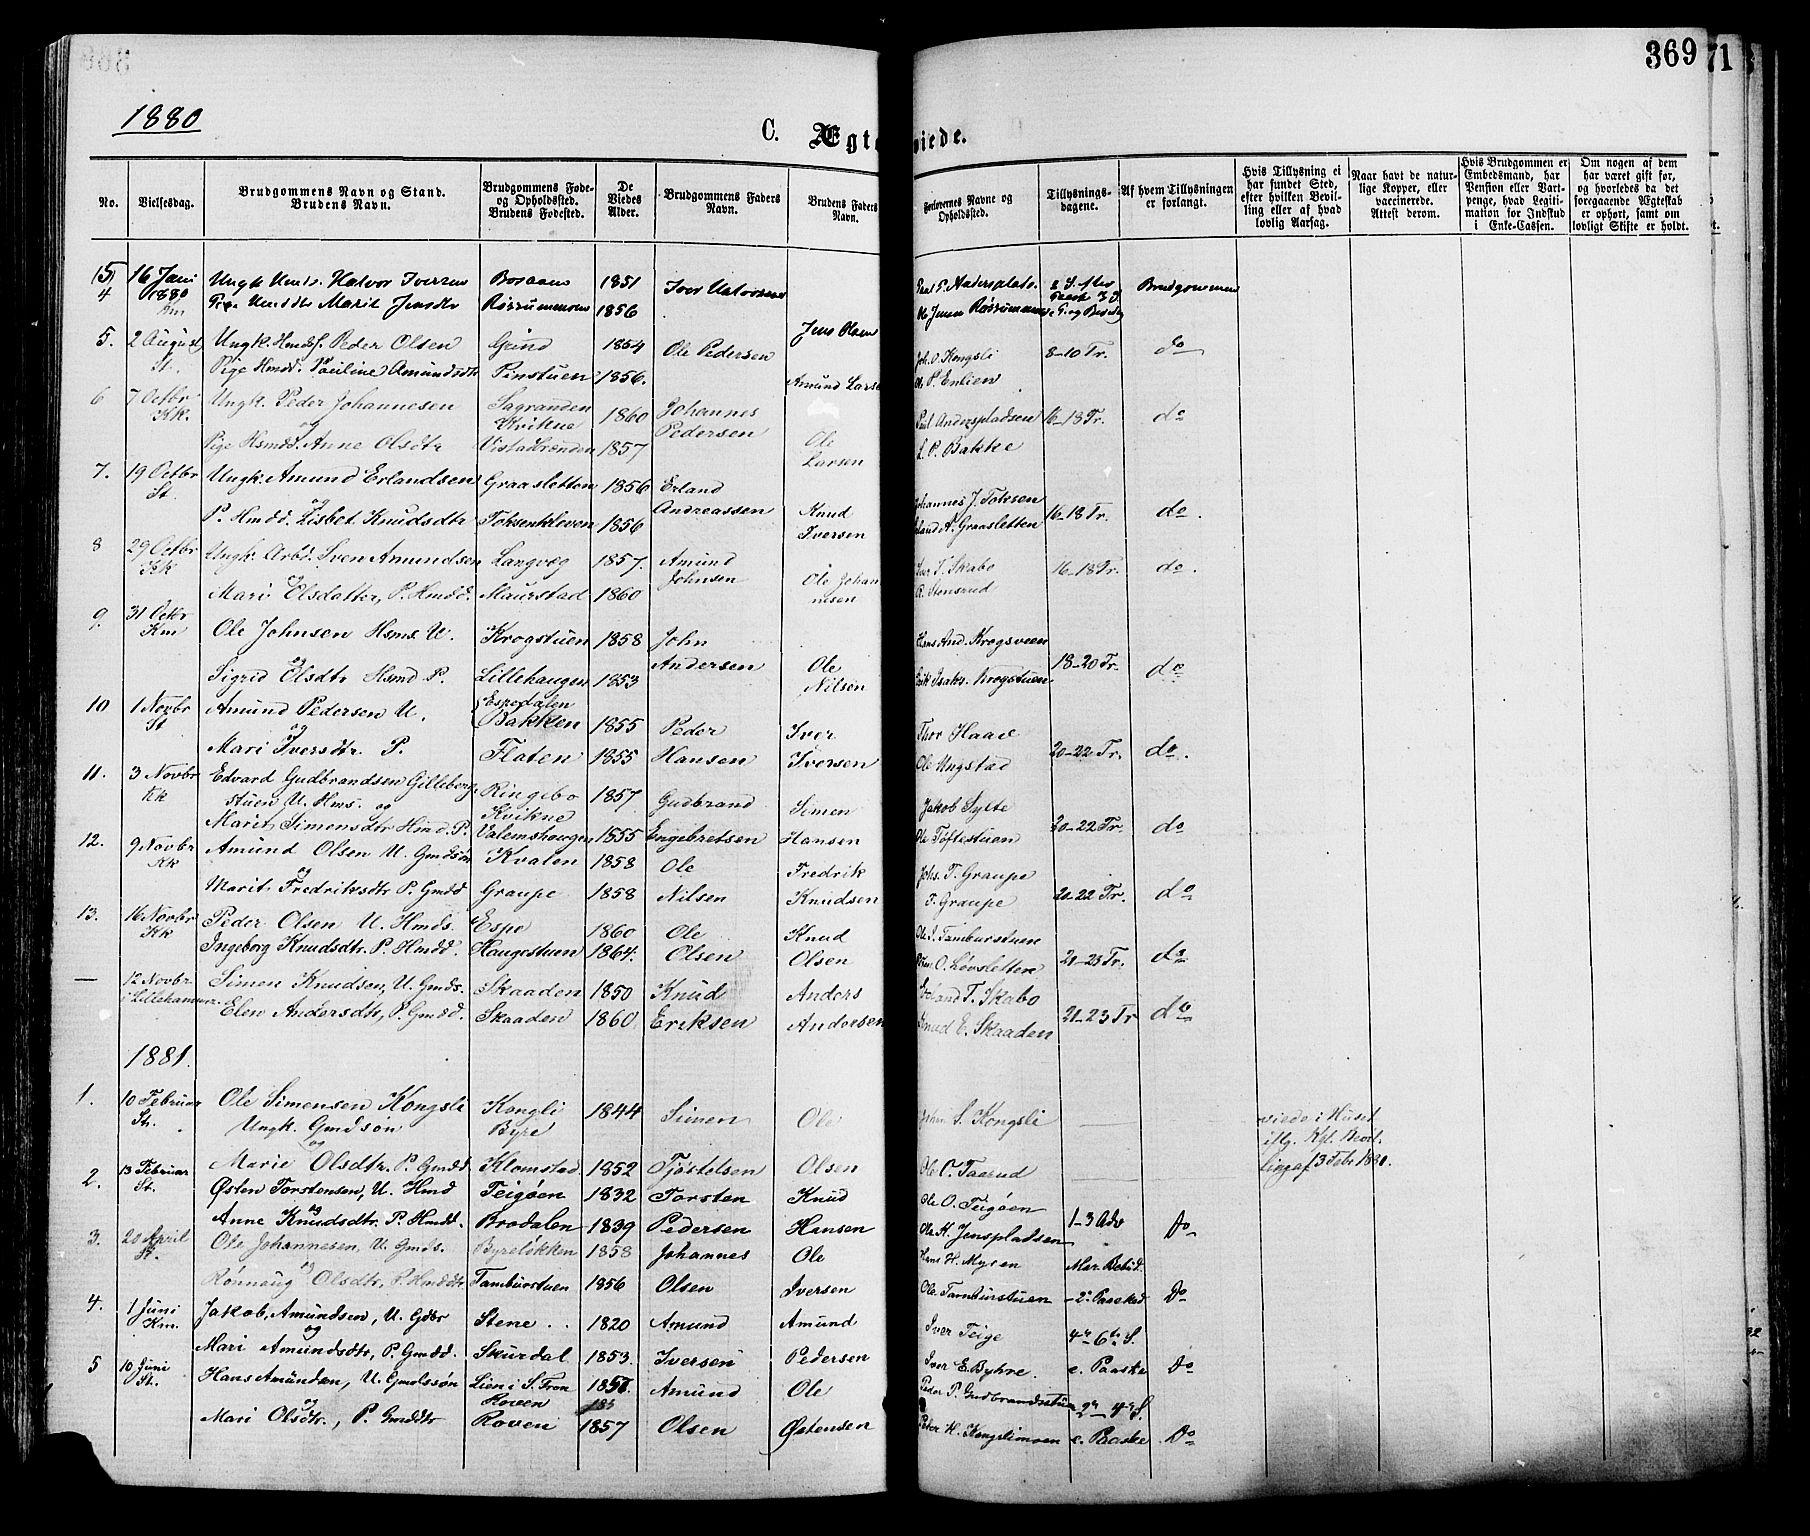 SAH, Nord-Fron prestekontor, Ministerialbok nr. 2, 1865-1883, s. 369